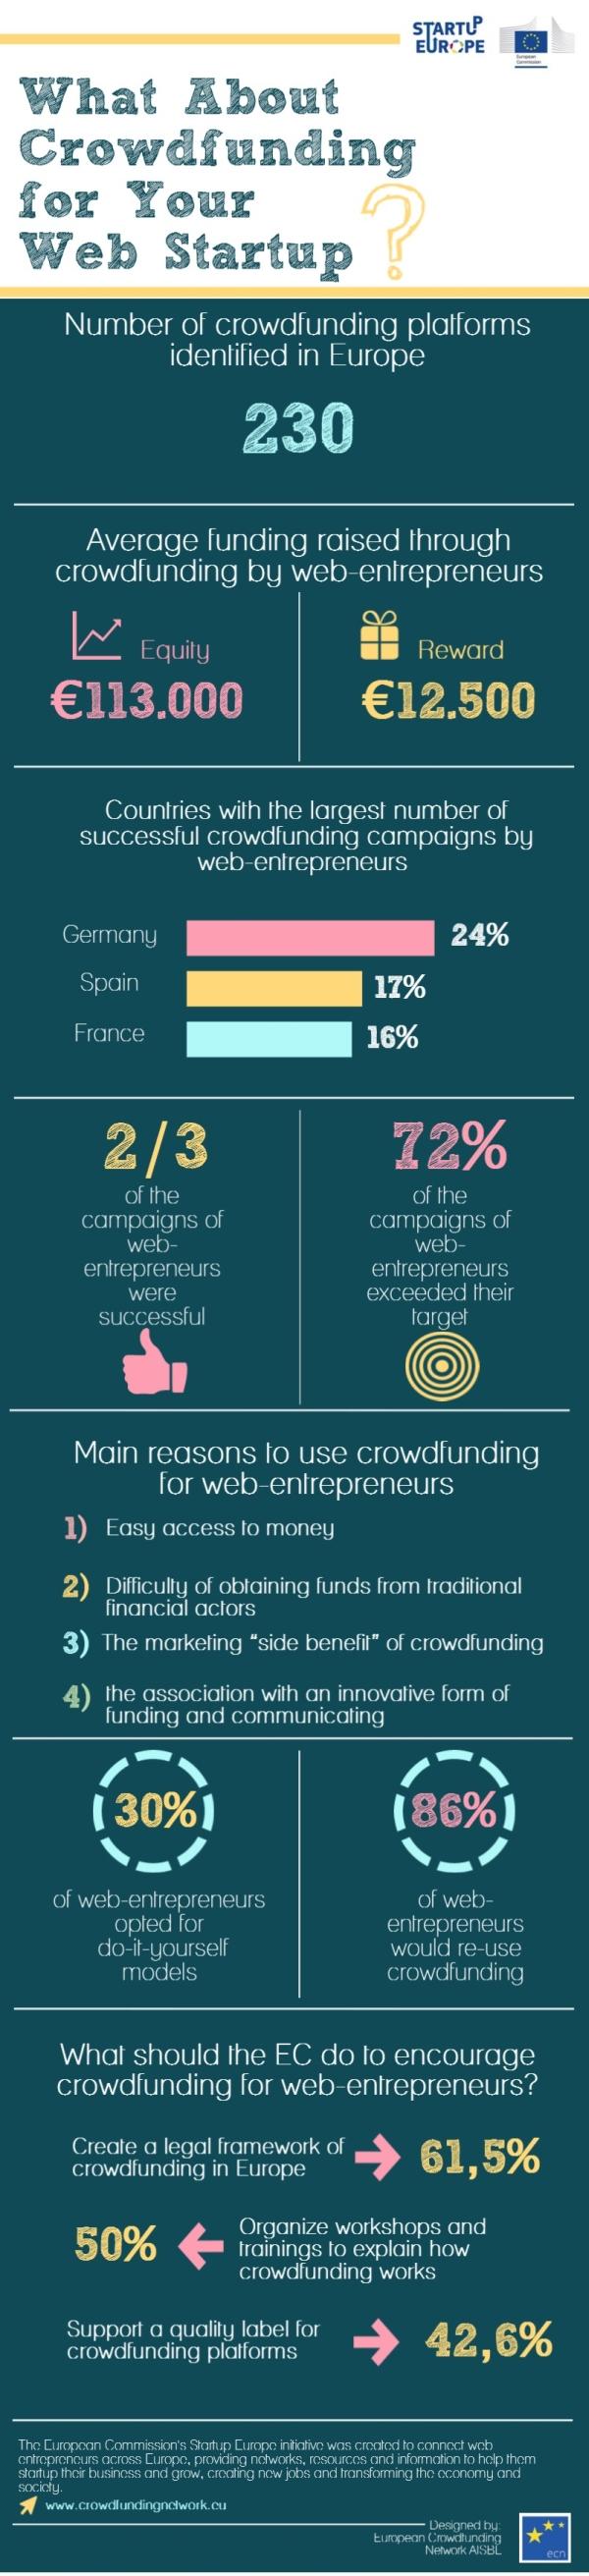 EC-Startup-Europe-infographic-2_600